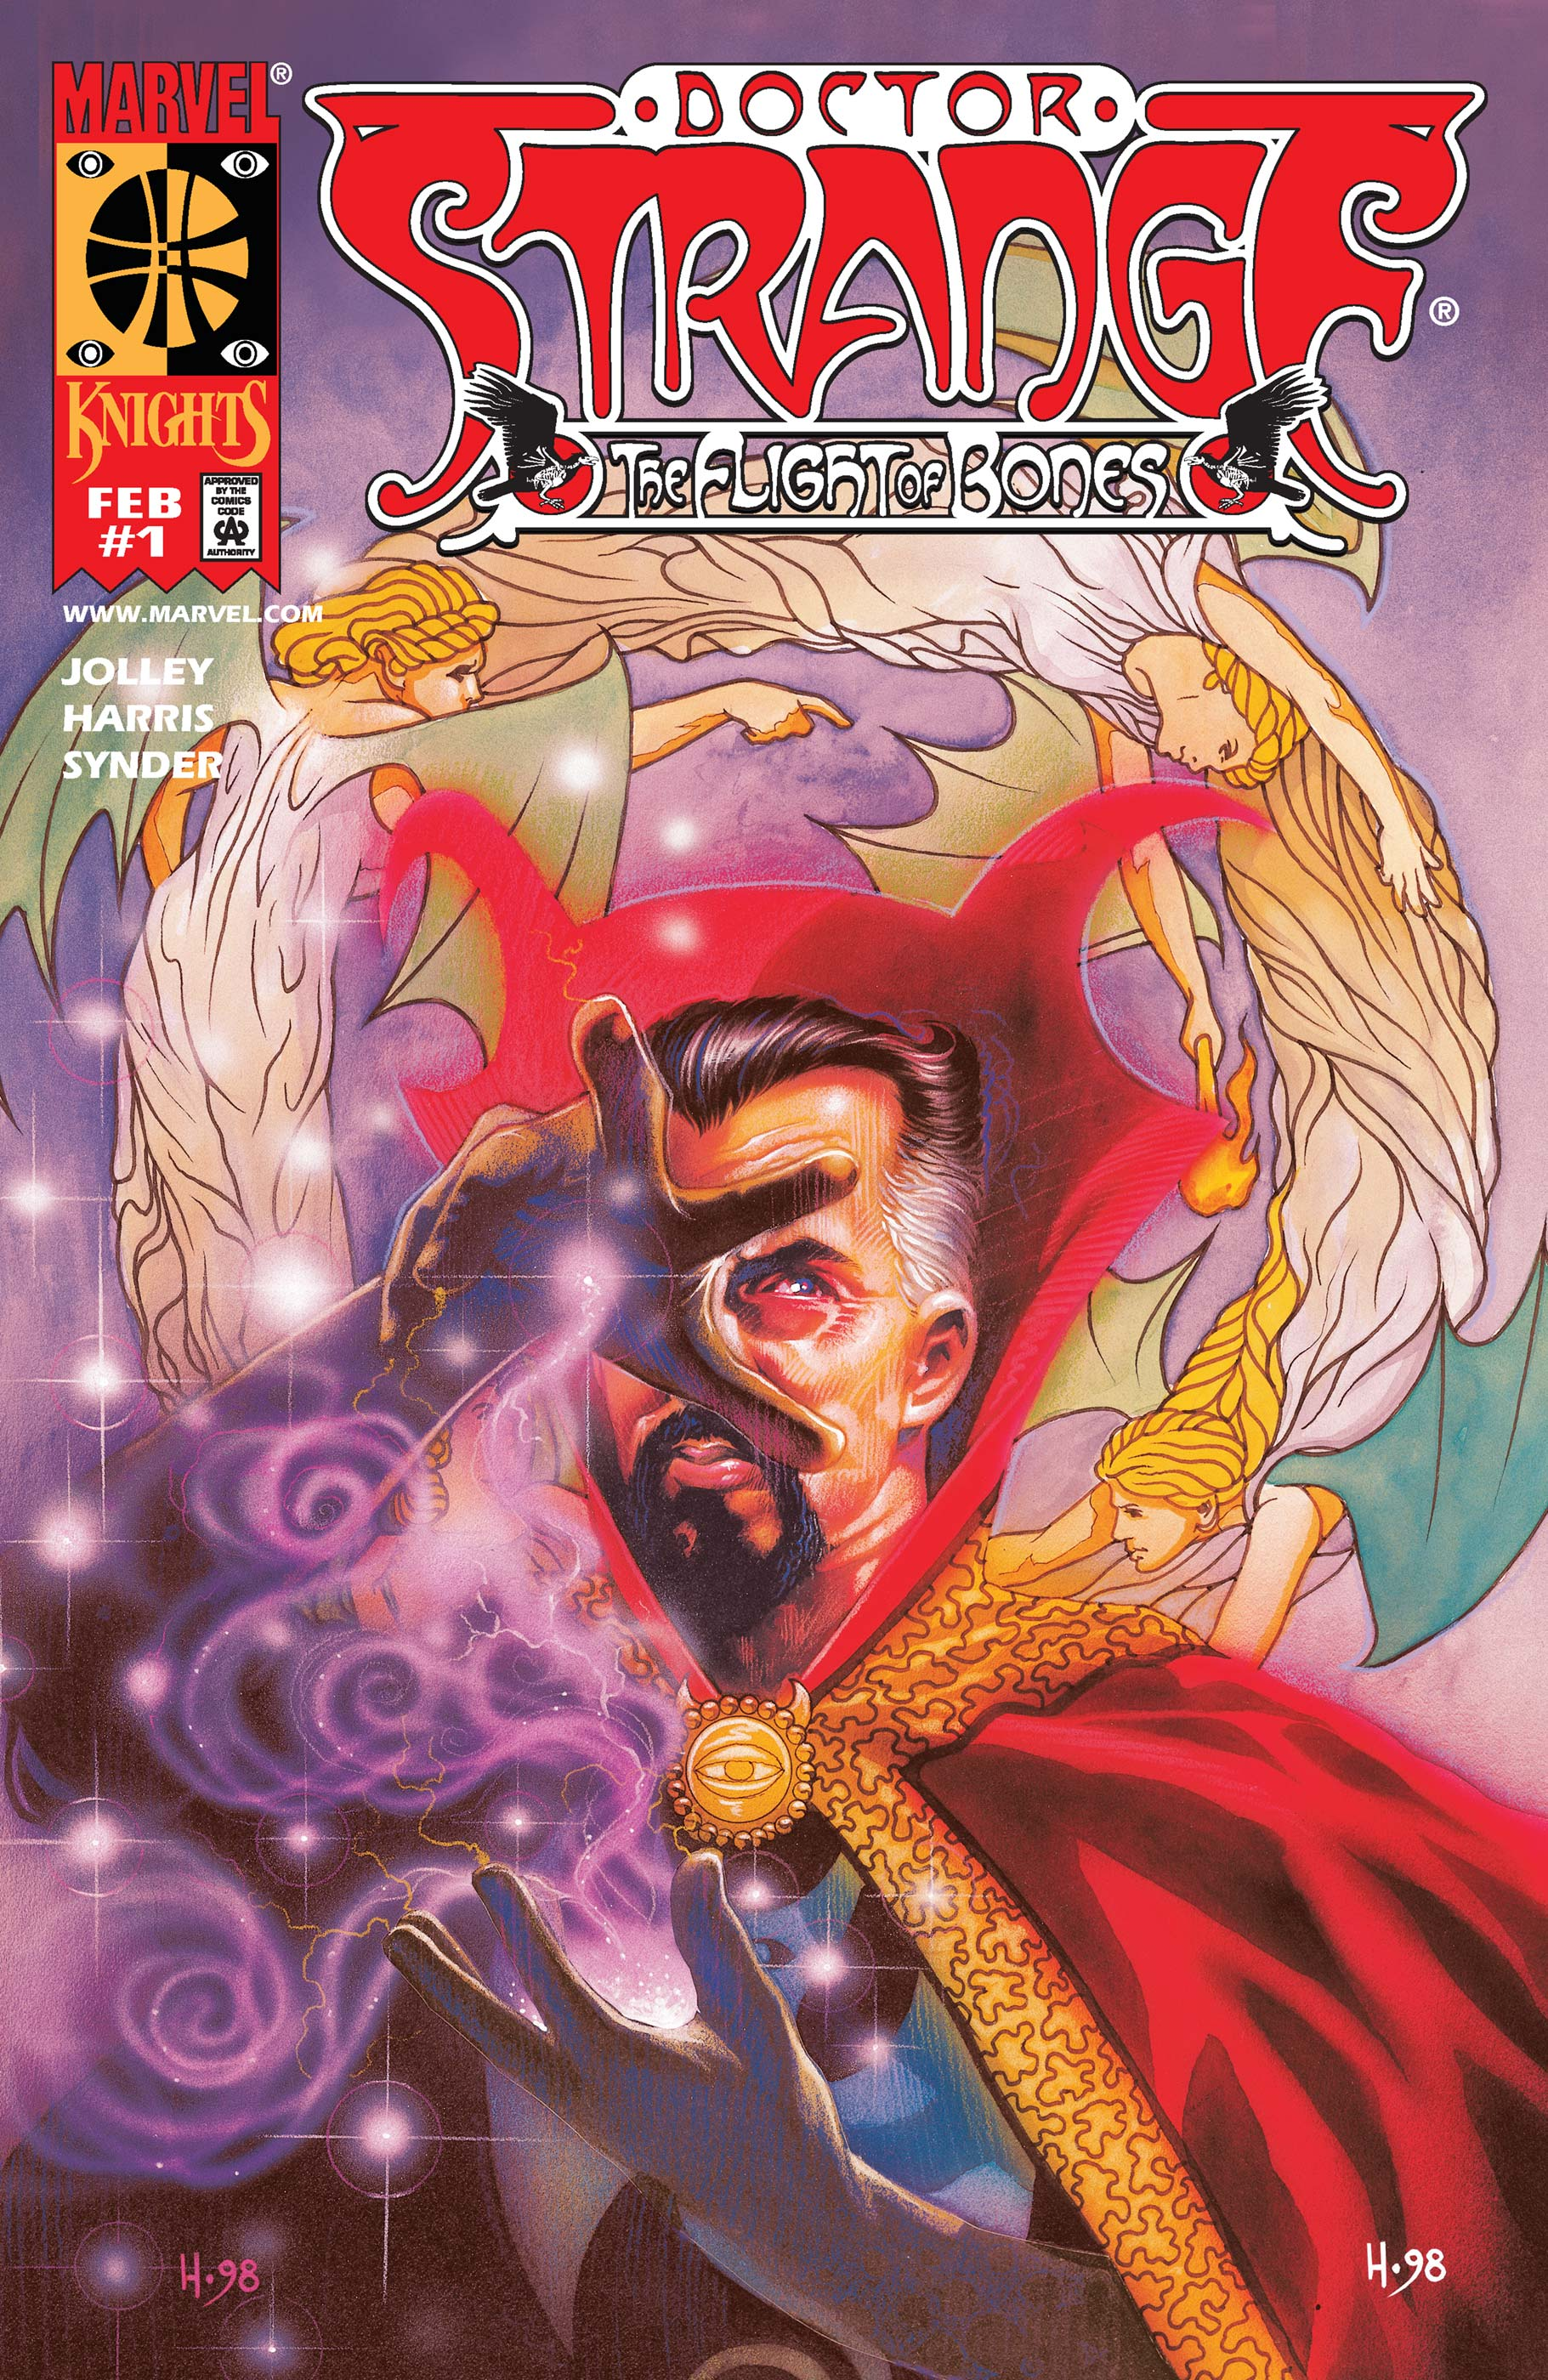 Doctor Strange: The Flight of Bones (1999) #1